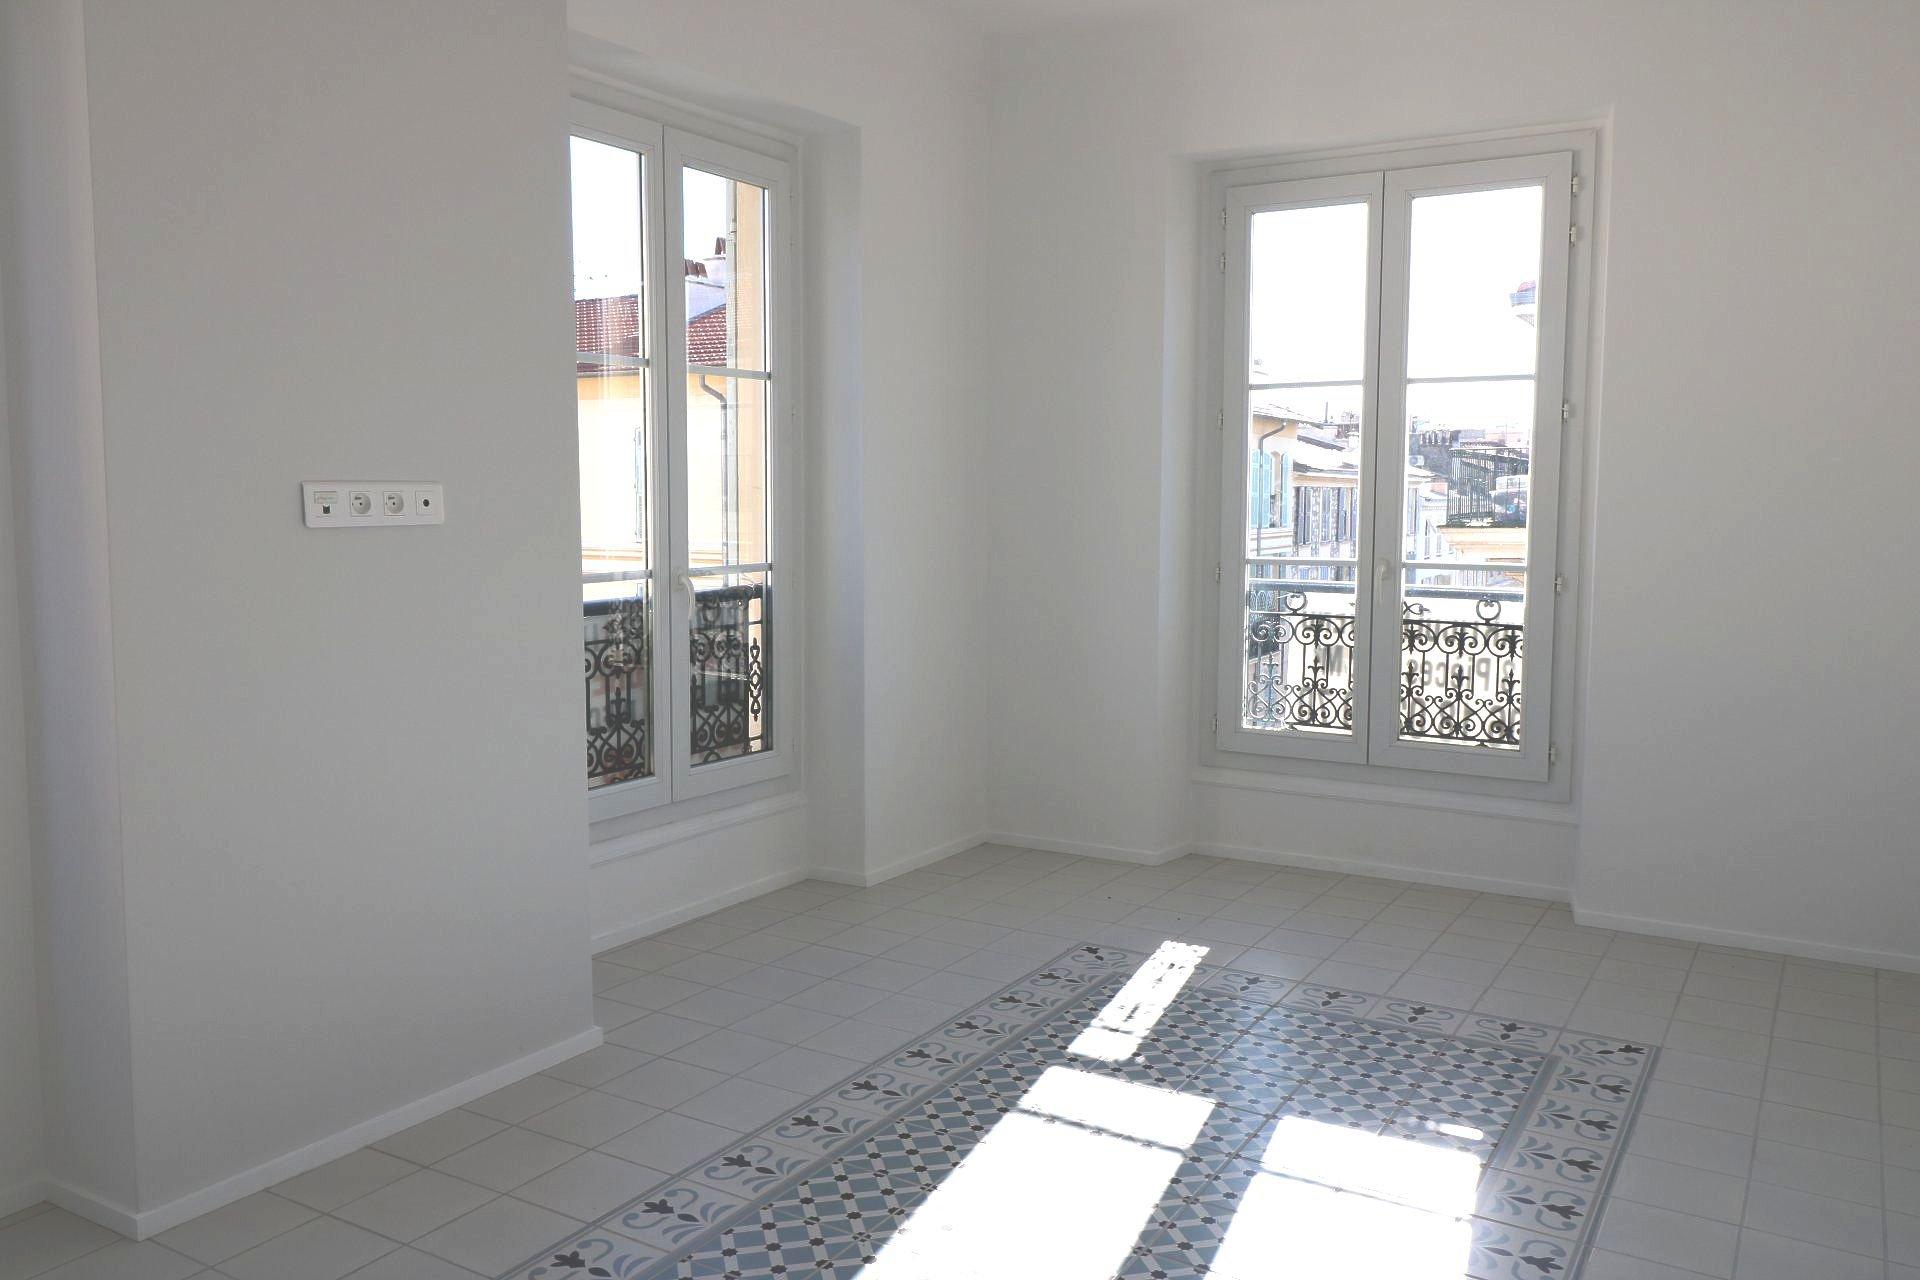 3-room, Carré d'Or district